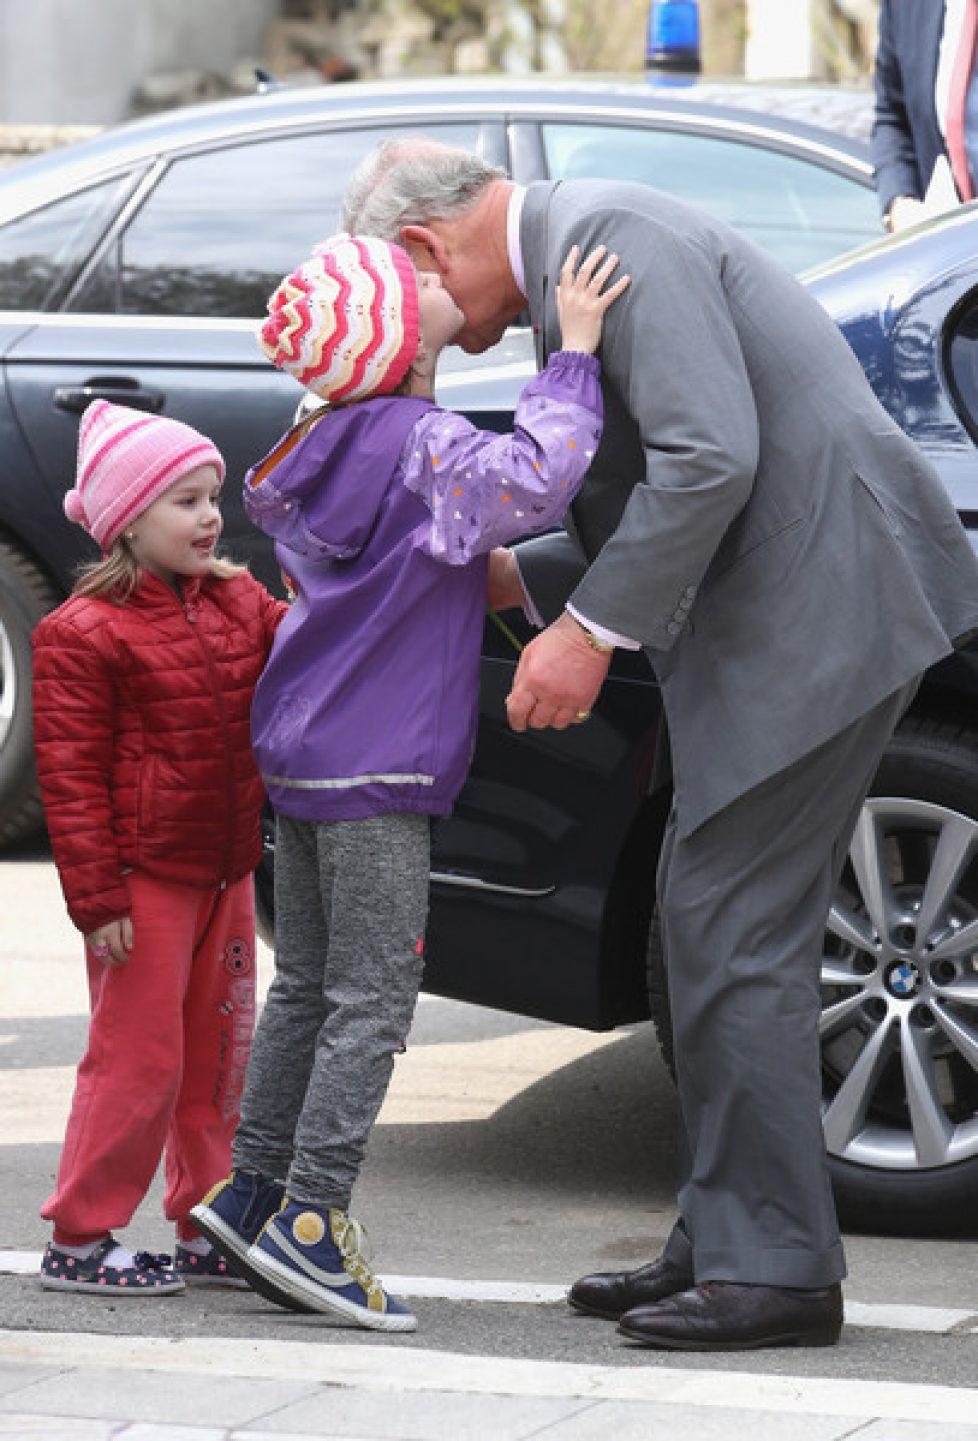 Prince+Wales+Visits+Romania+Day+2+qThtX4tAFRDl